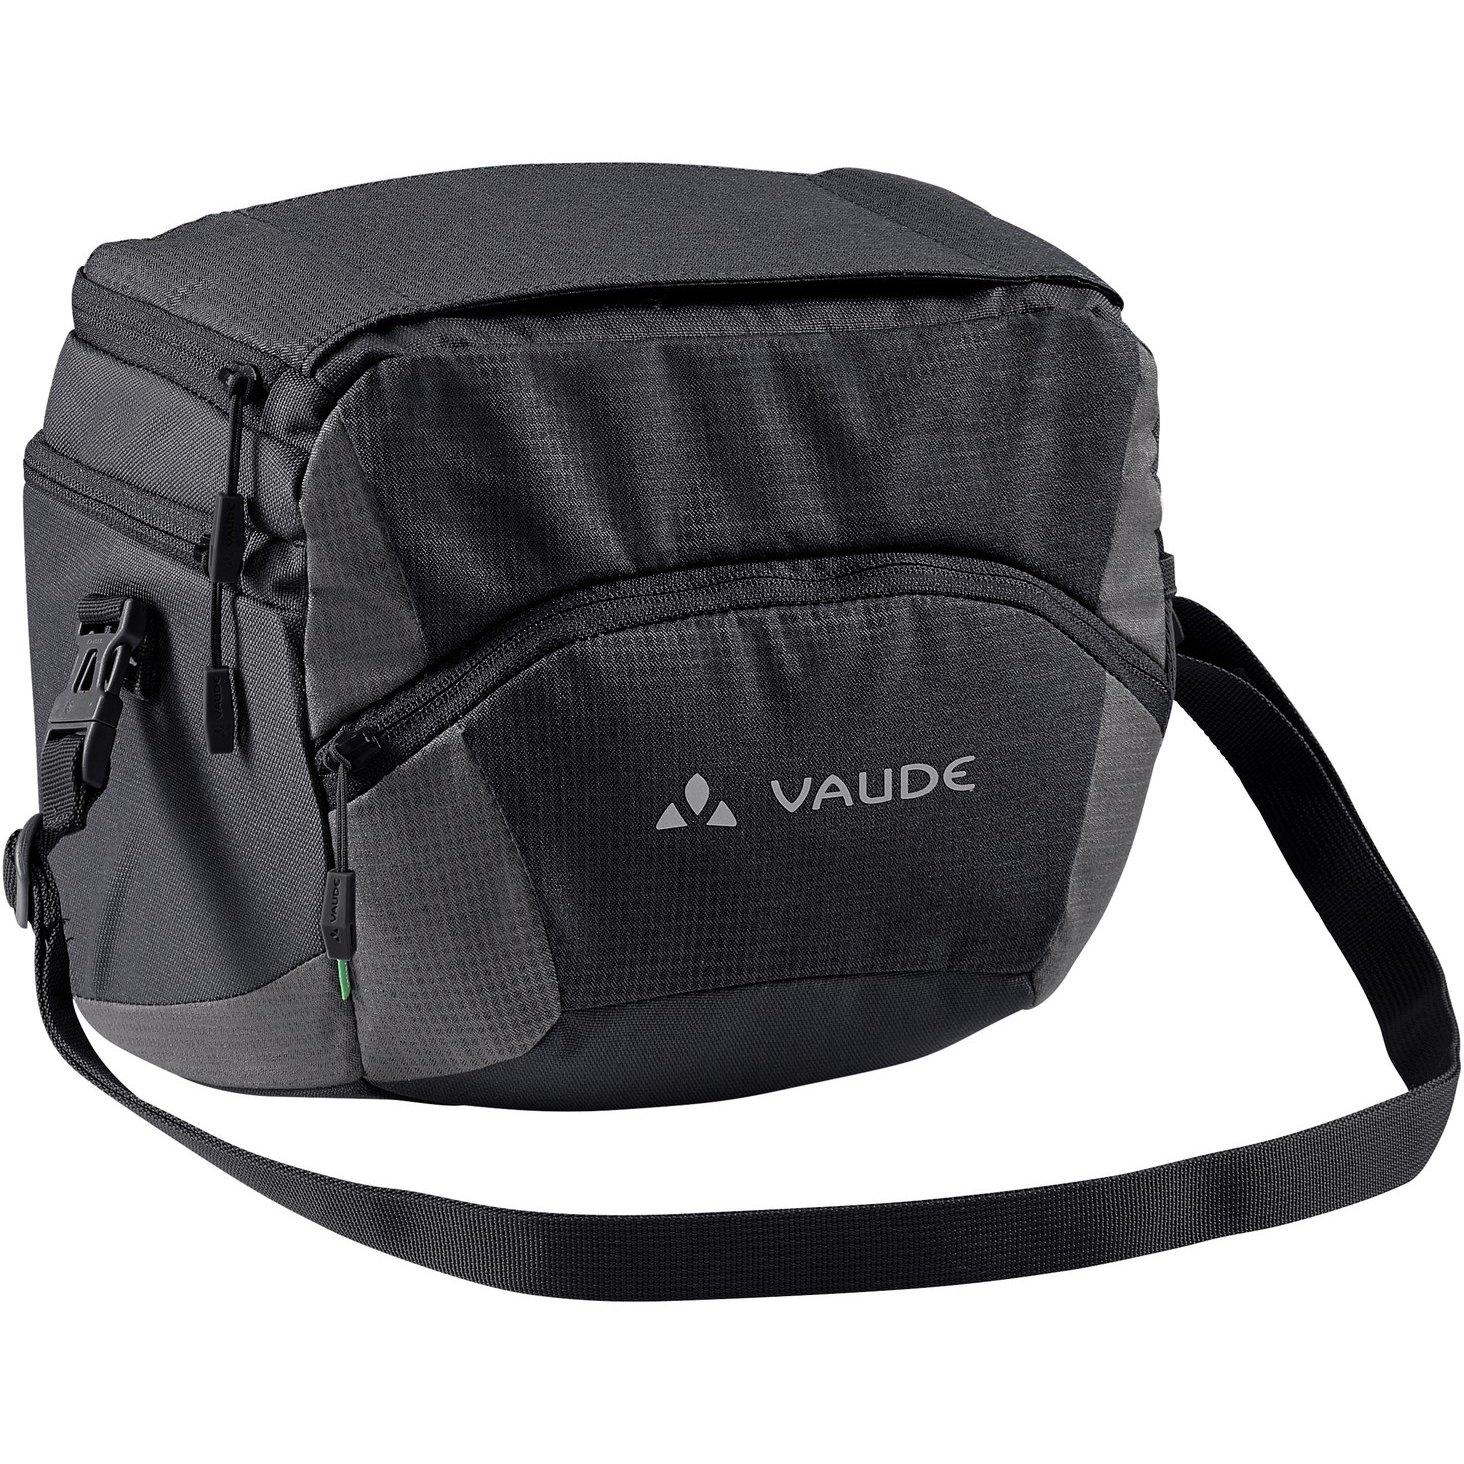 Image of Vaude OnTour Box L (KLICKfix ready) Handlebar Bag - black